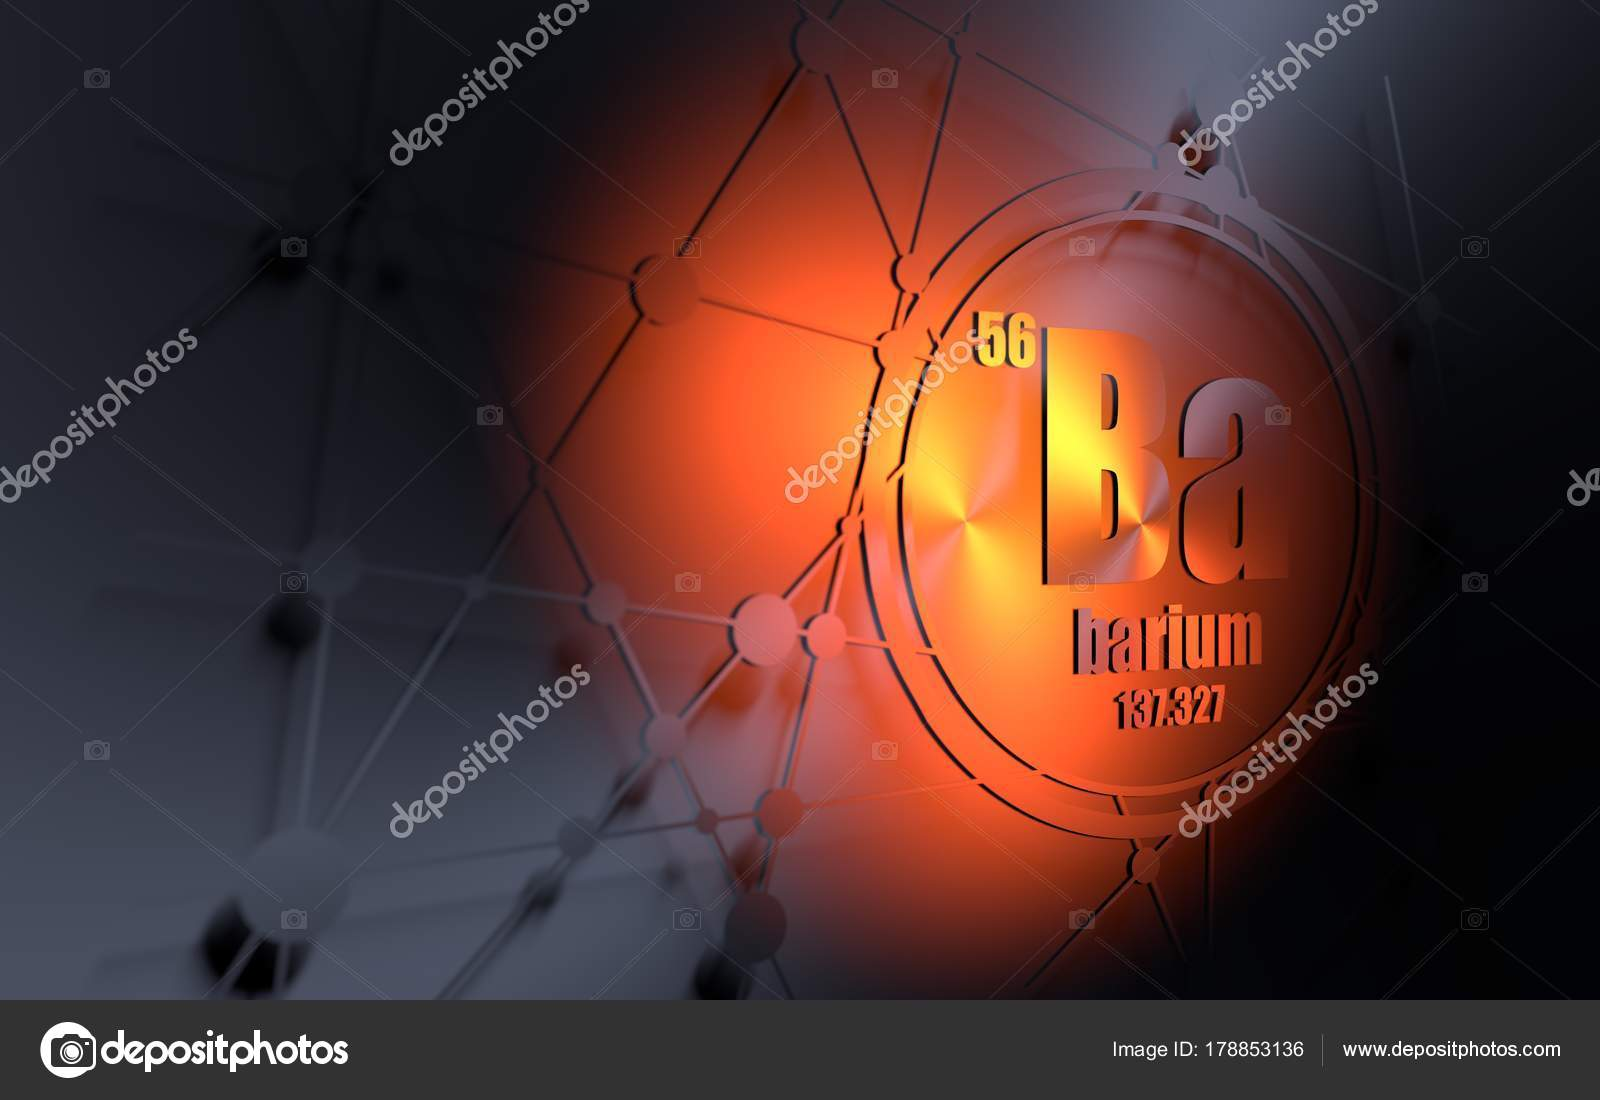 Barium chemical element stock photo jegasra 178853136 barium chemical element sign with atomic number and atomic weight chemical element of periodic table molecule and communication background biocorpaavc Images